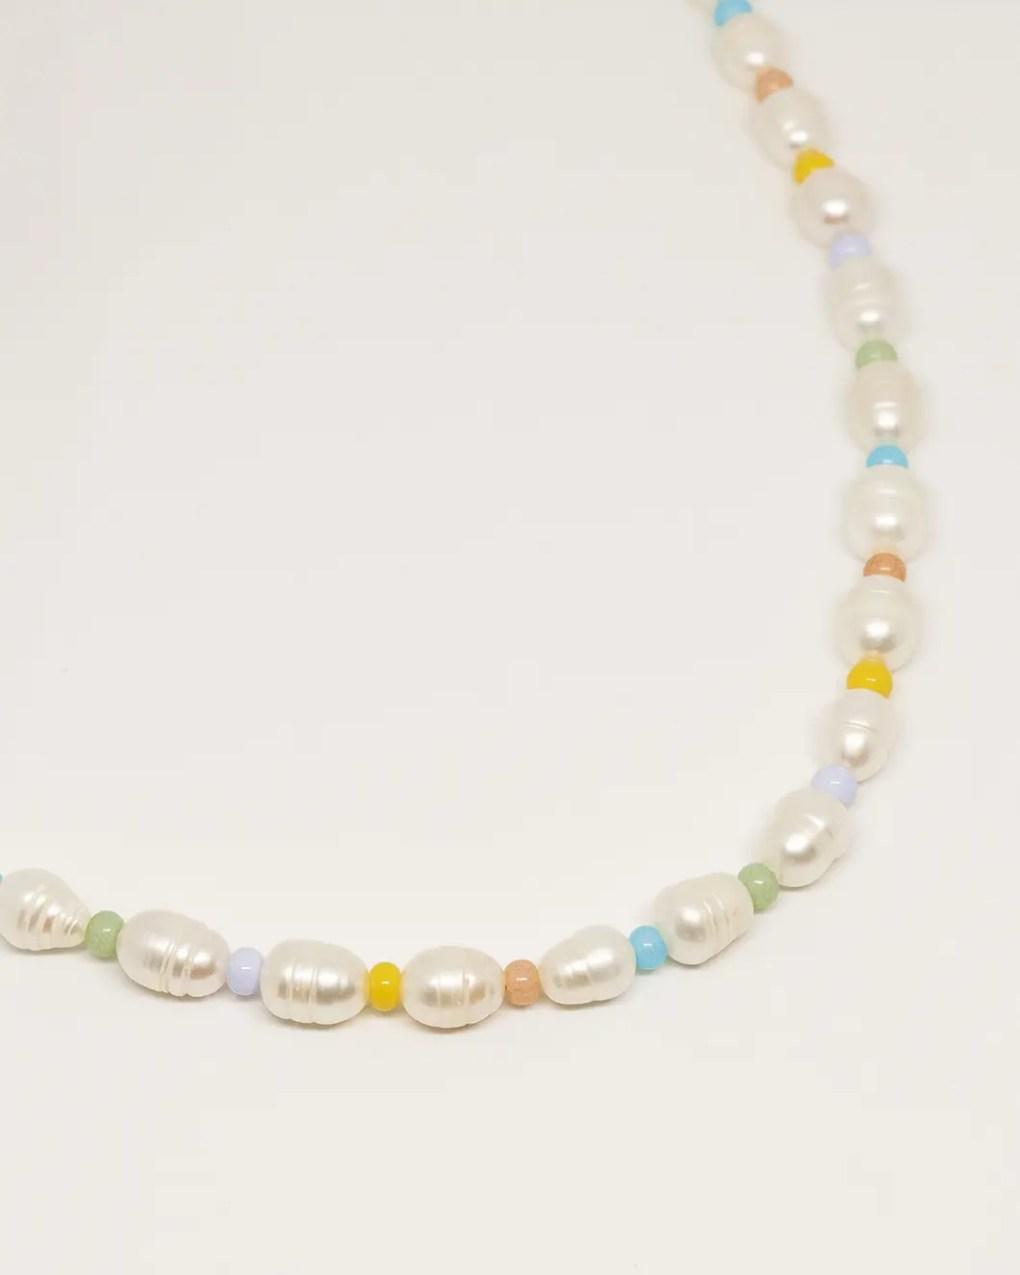 collier perles de culture rocailles colore suzie zodiacijewelry 001